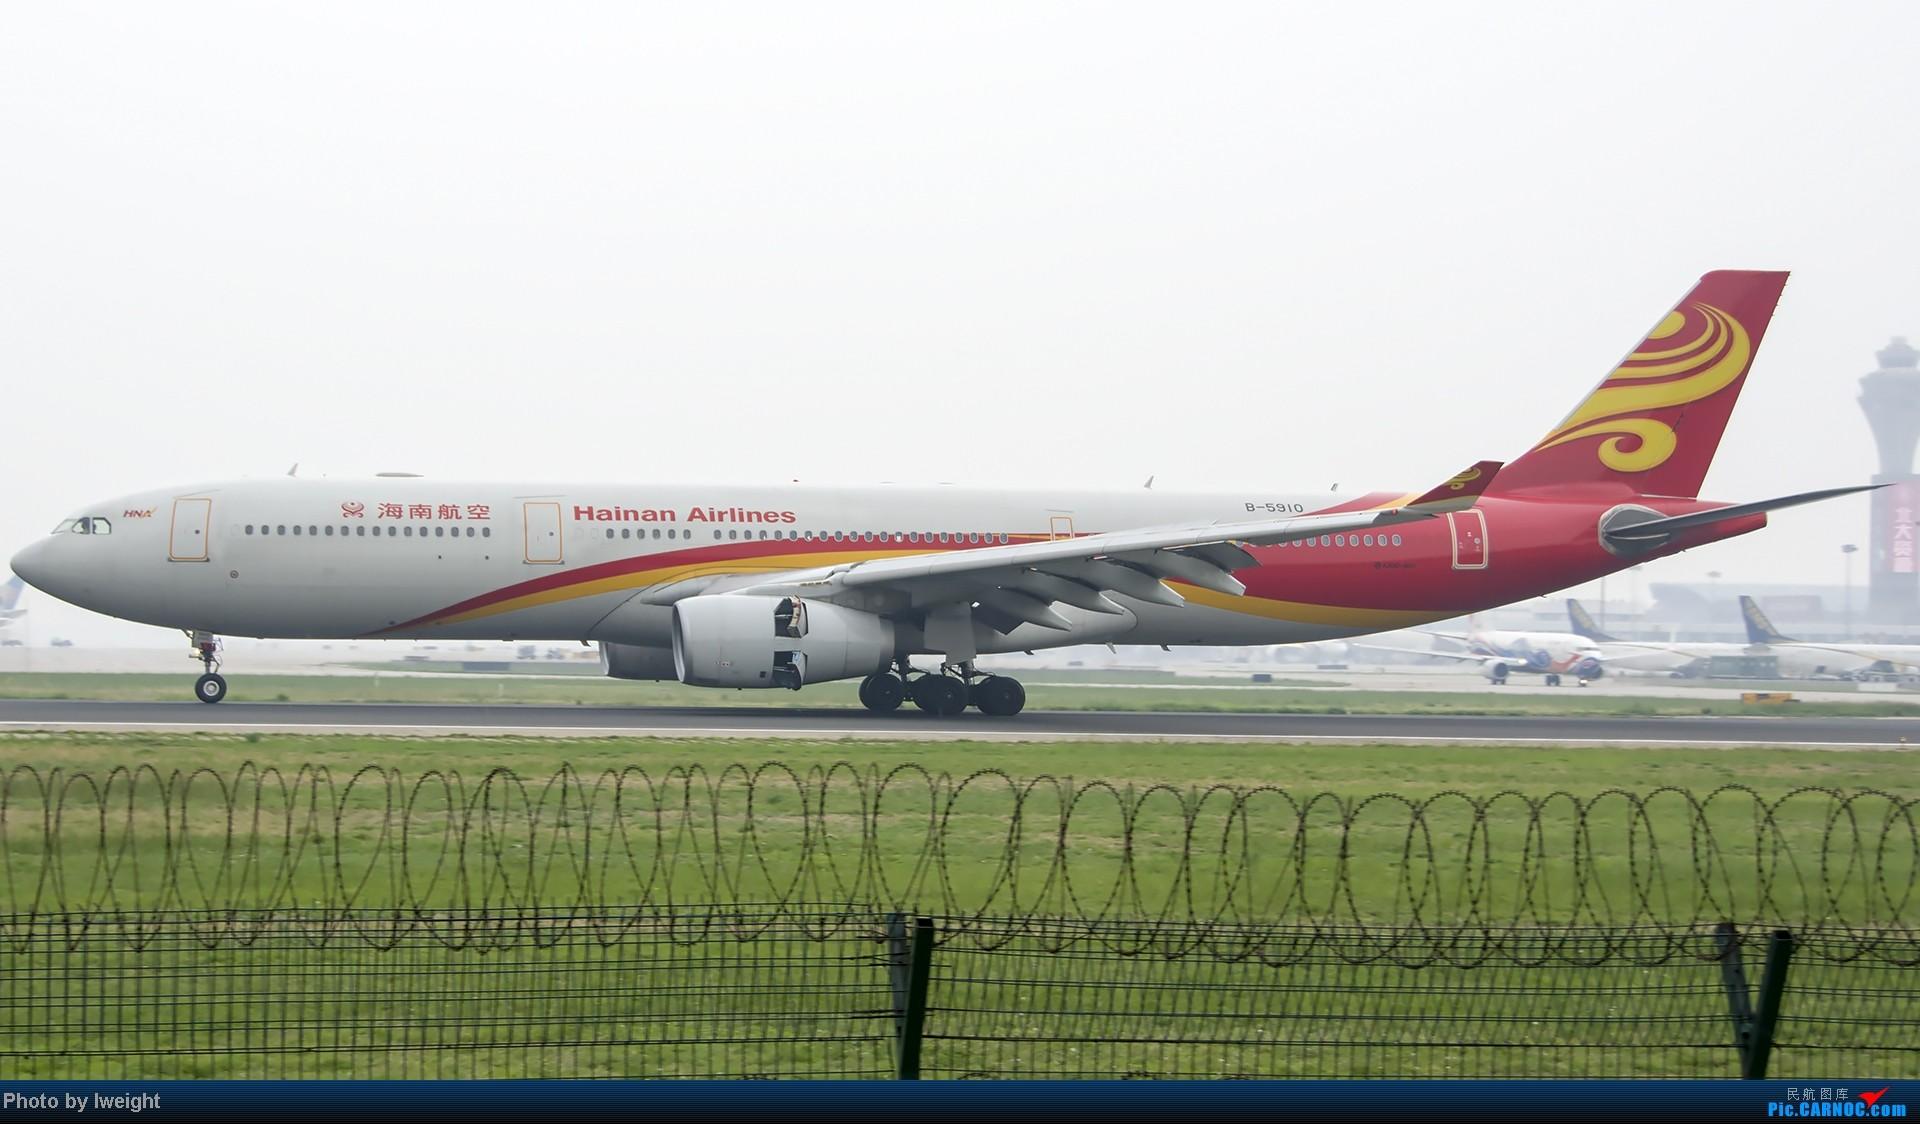 Re:[原创]休假无聊,跑道边来拍机玩(晚点的ZestAir、换装的B6100和刚交付的B2738等) AIRBUS A330-300 B-5910 中国北京首都机场